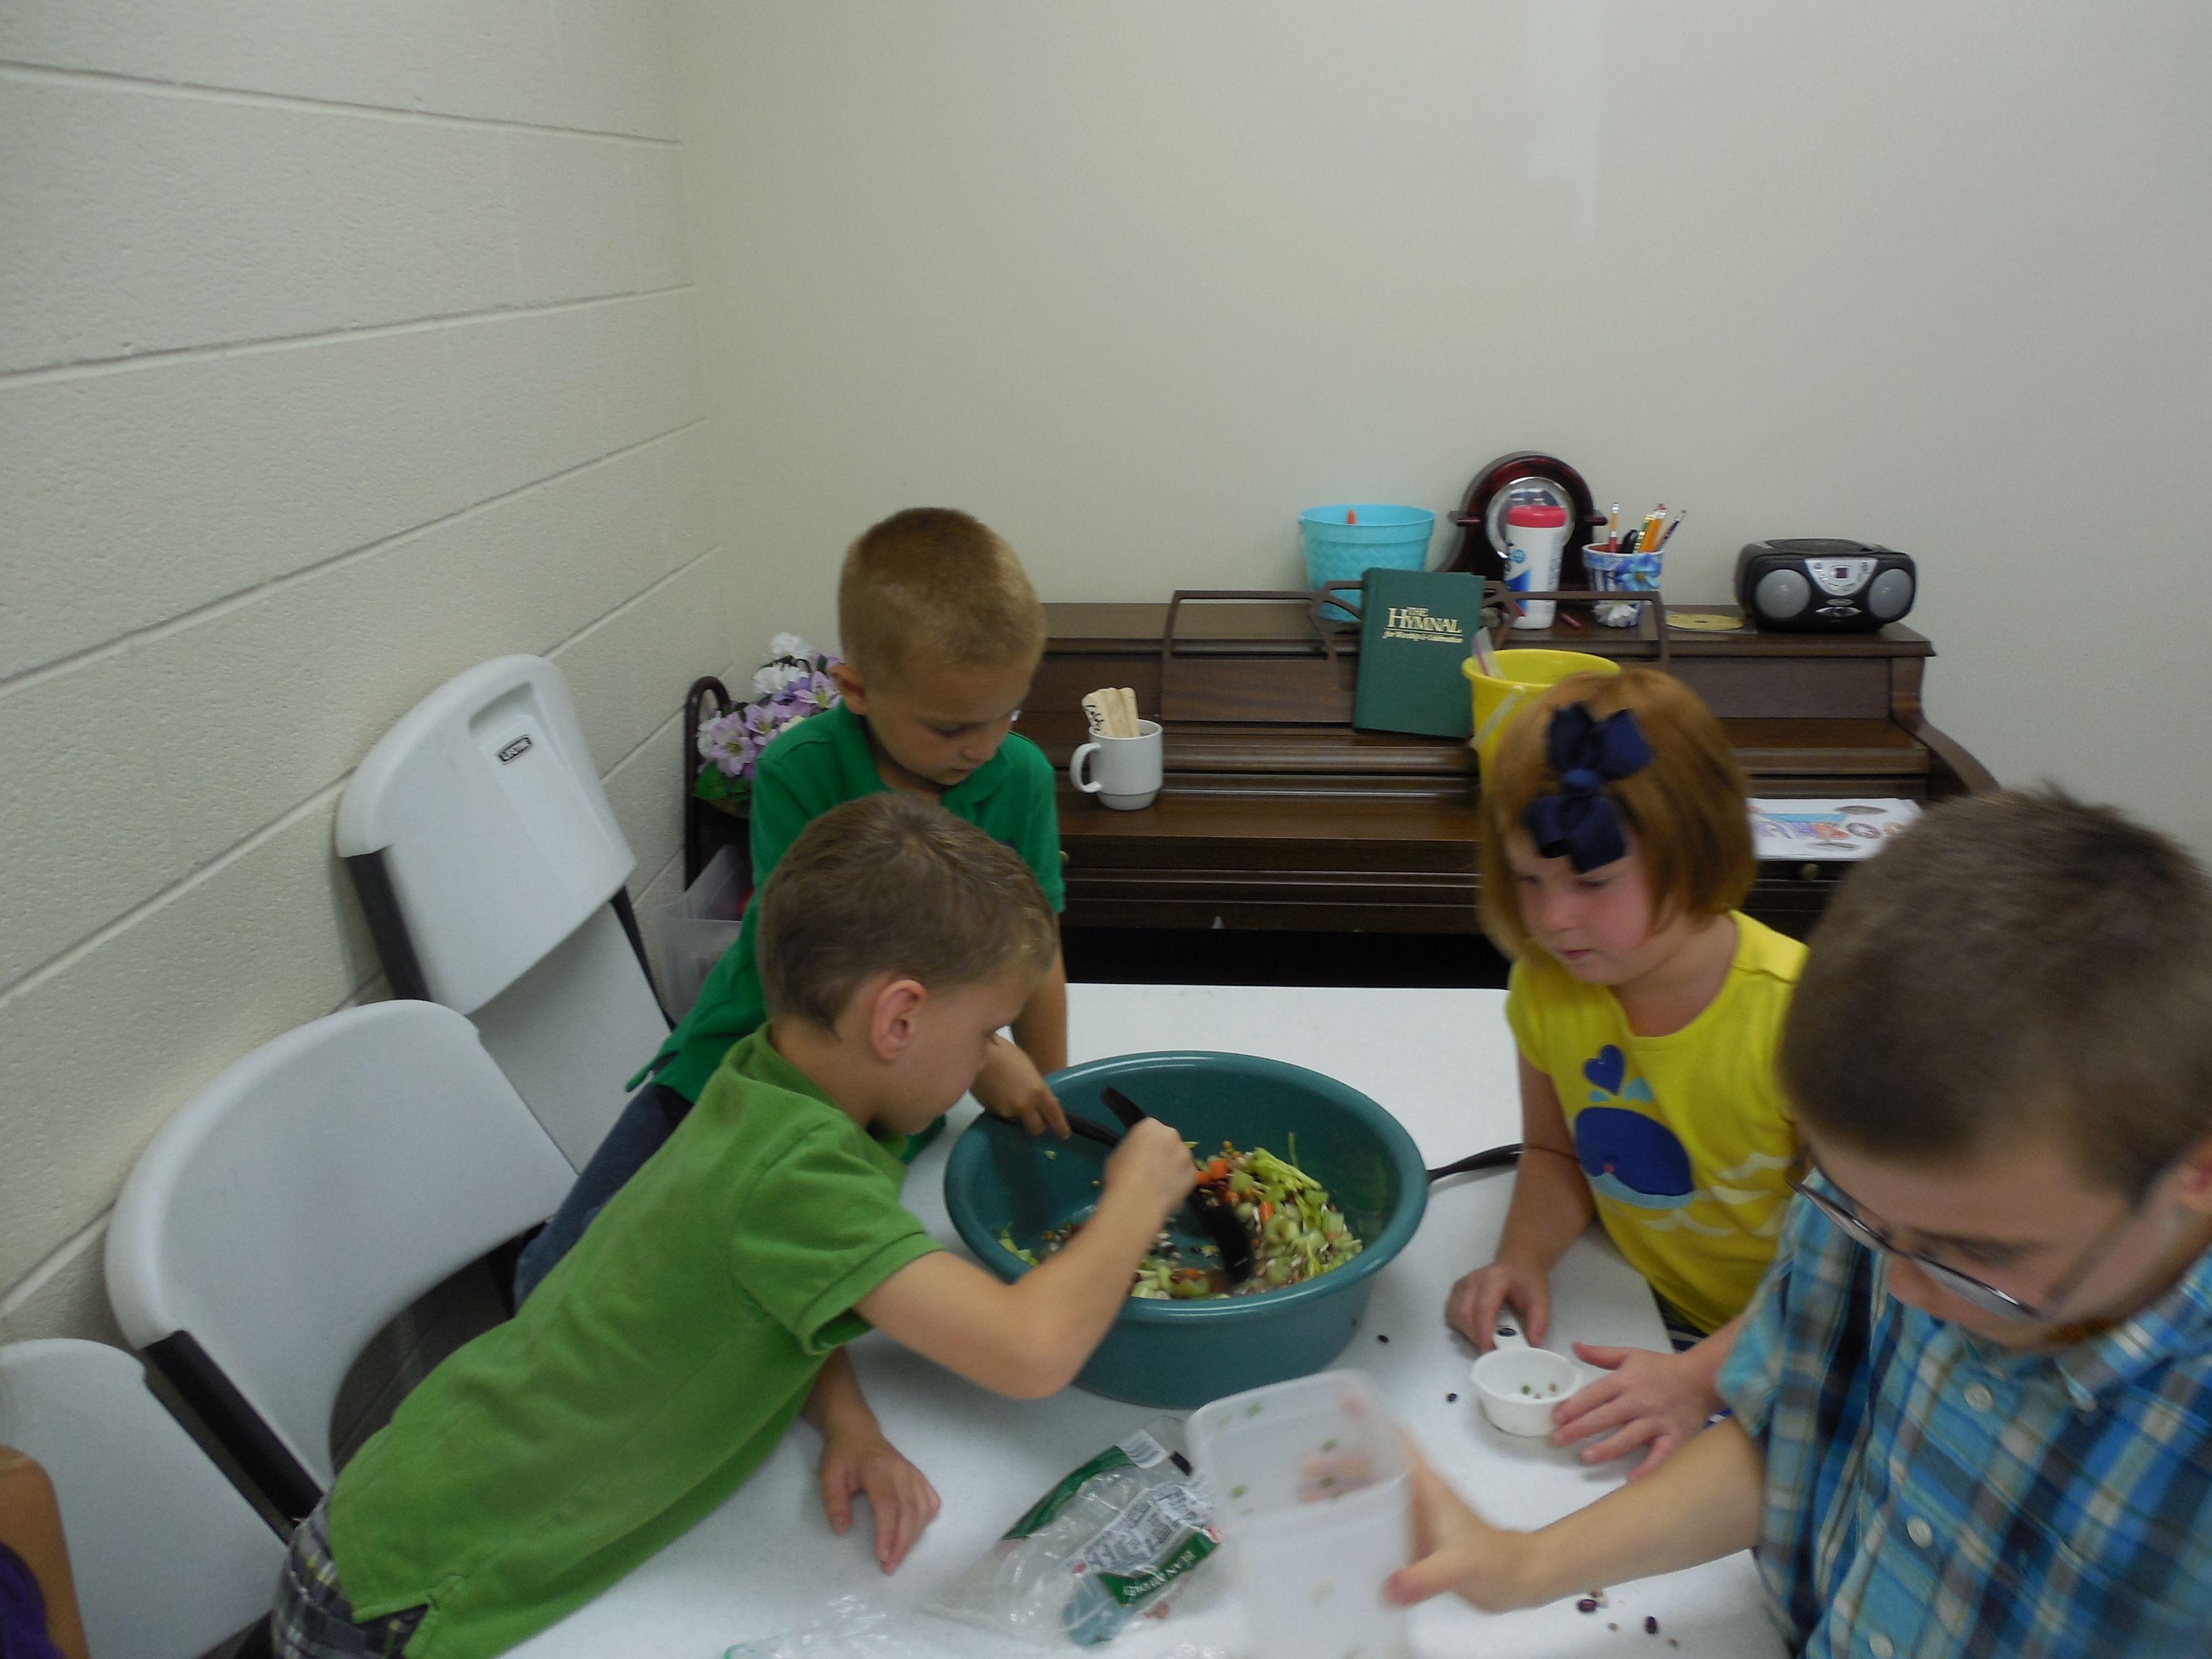 Jacob And Esau Making A Stew